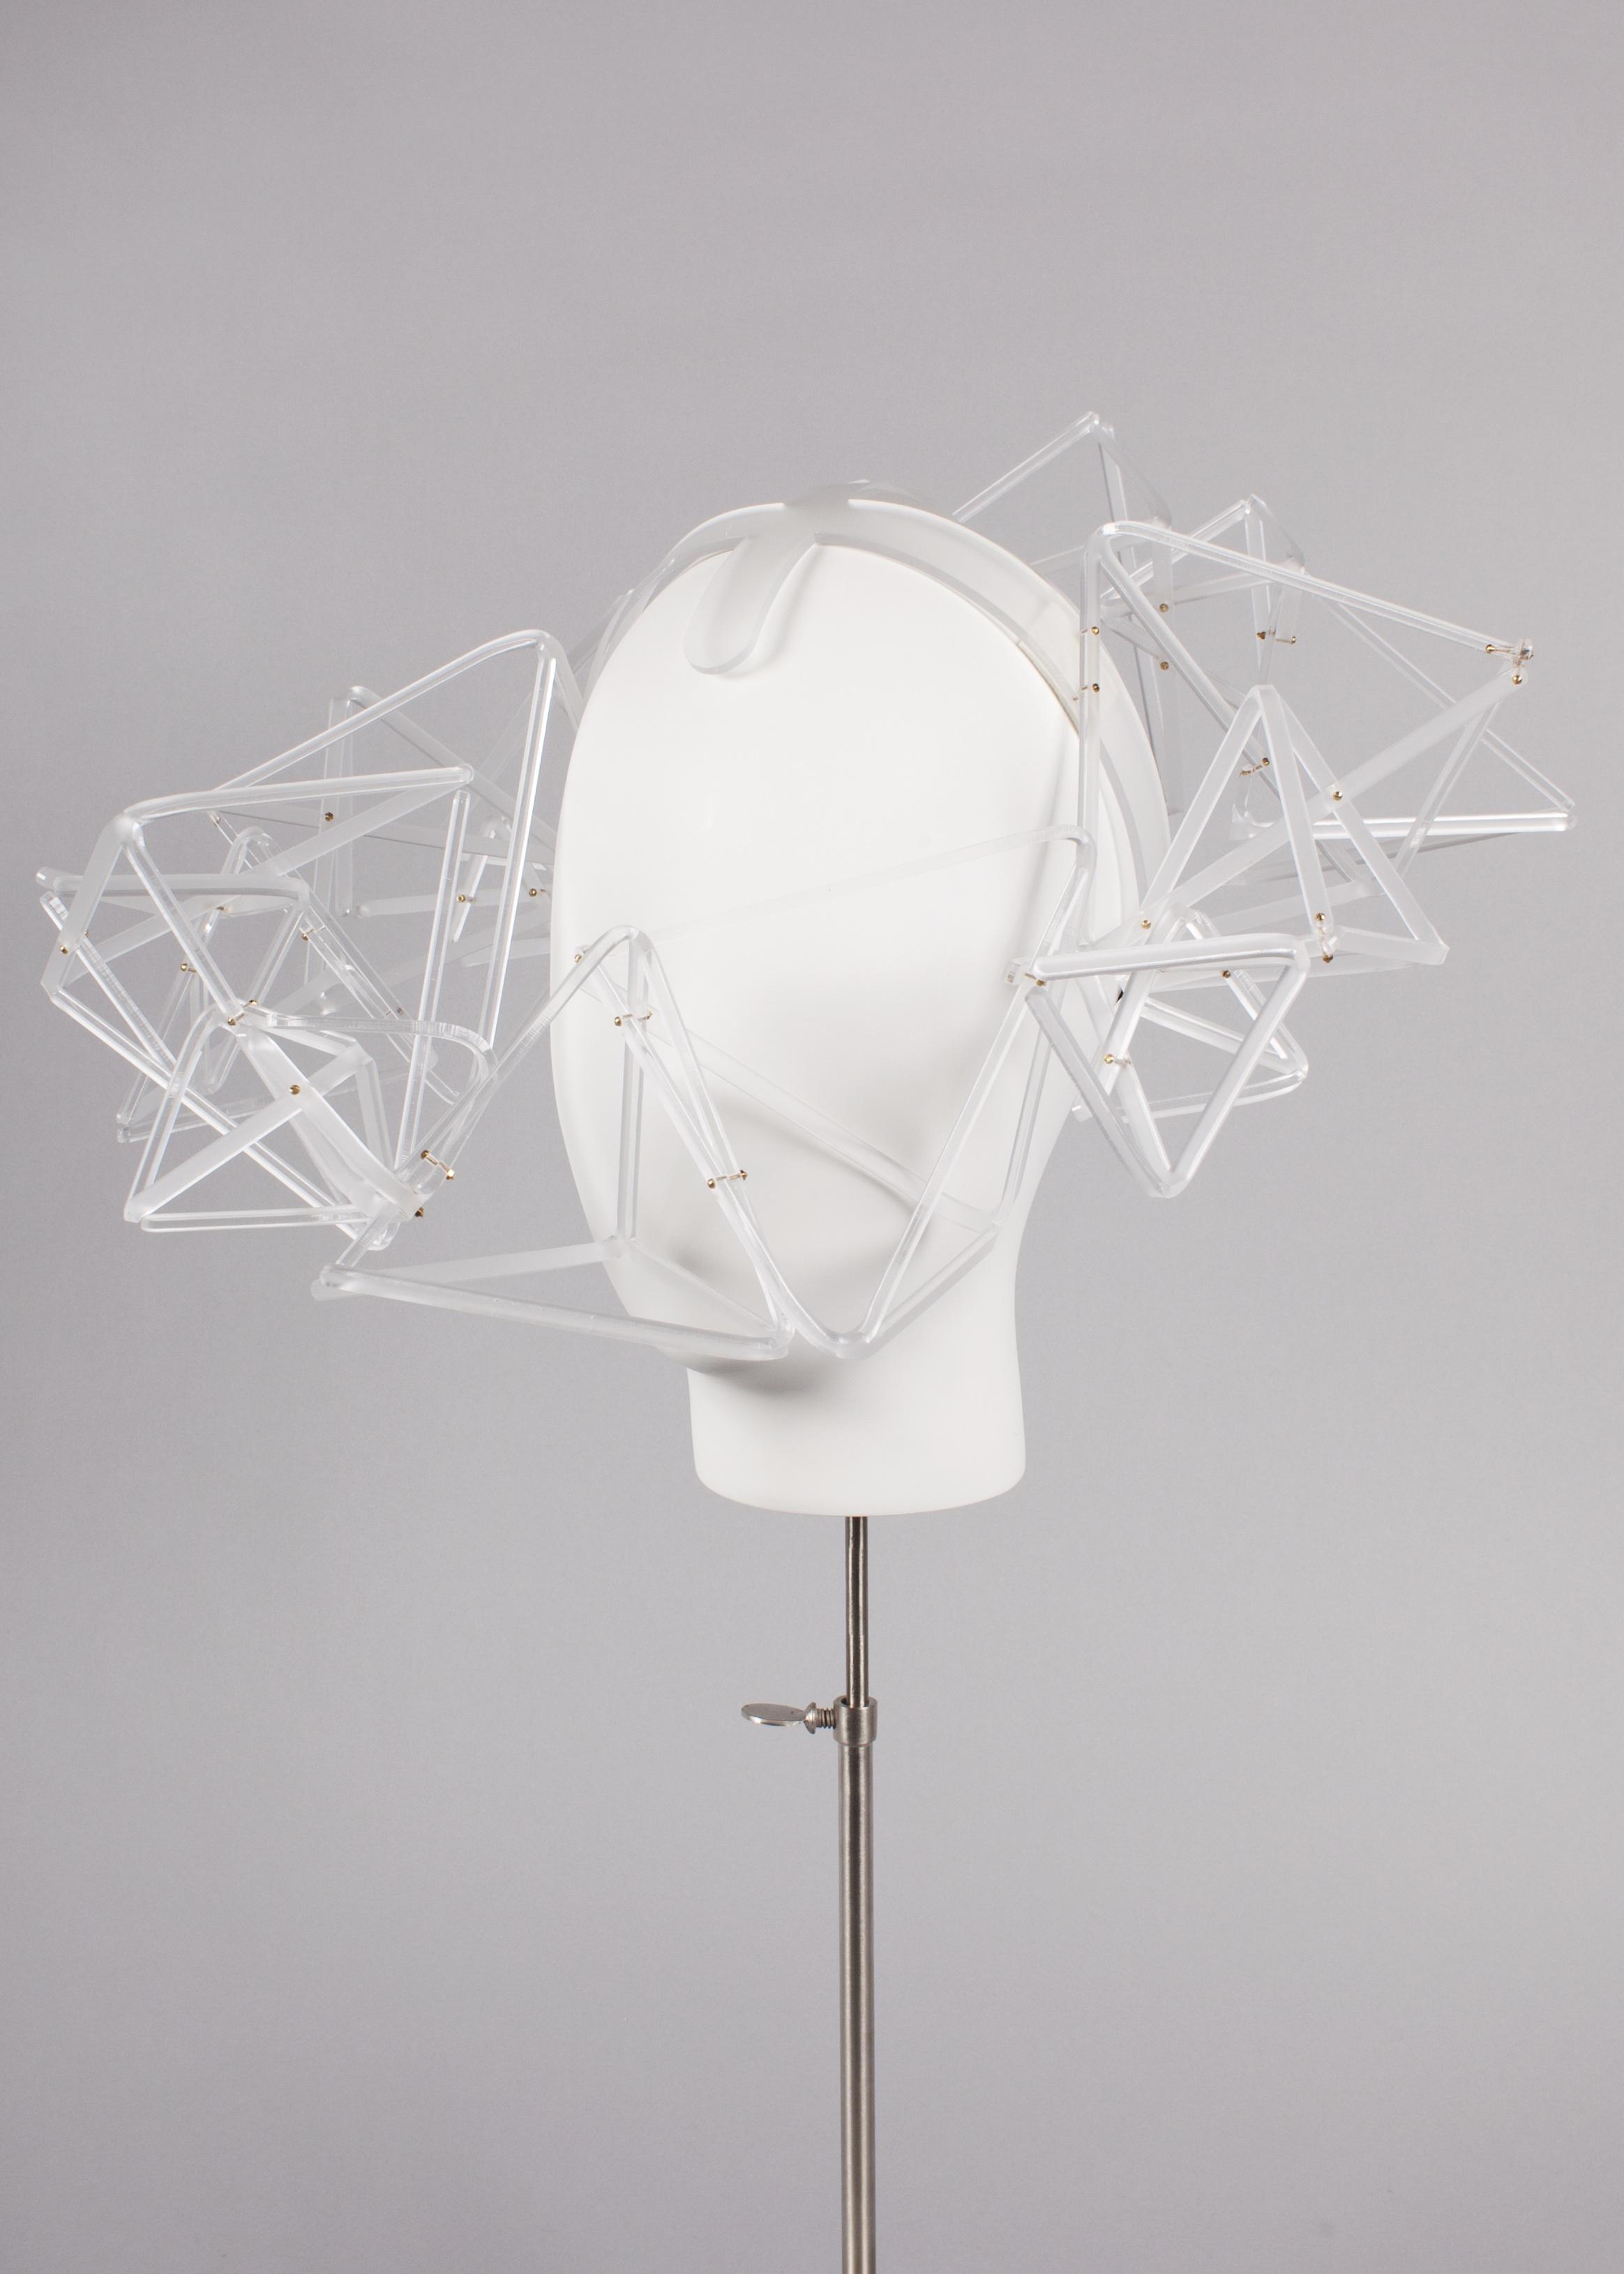 Tidal Wave Headpiece